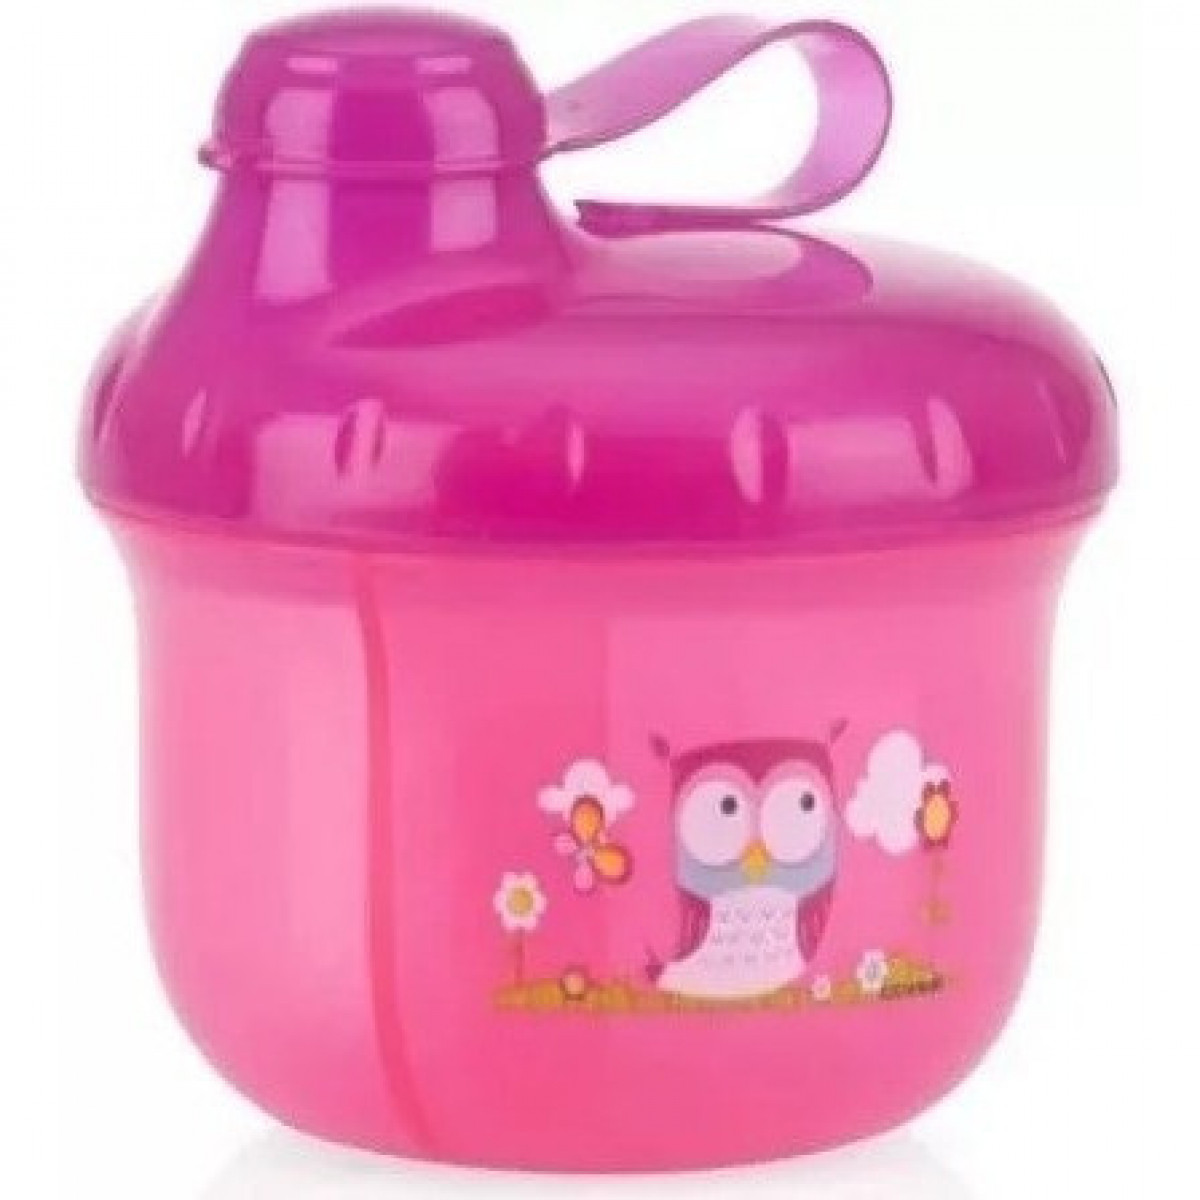 Dispenser de leche  Nuby rosa